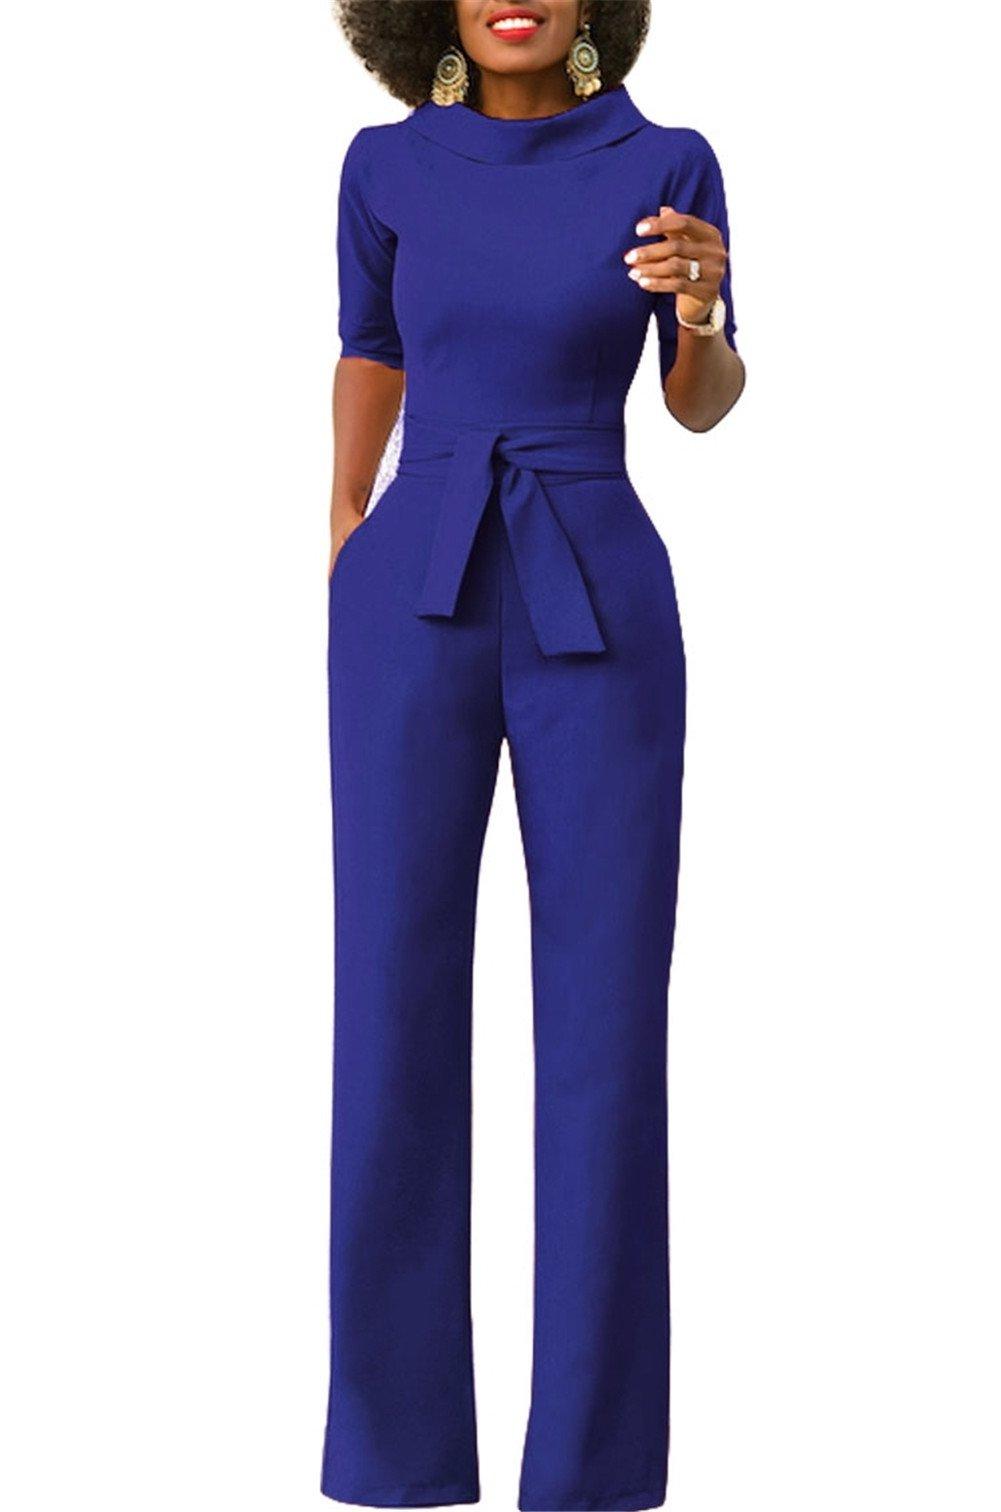 KISSMODA Women's Elegant Lapel Wide Leg Boot Cut Jumpsuit with Belt Blue X-Large